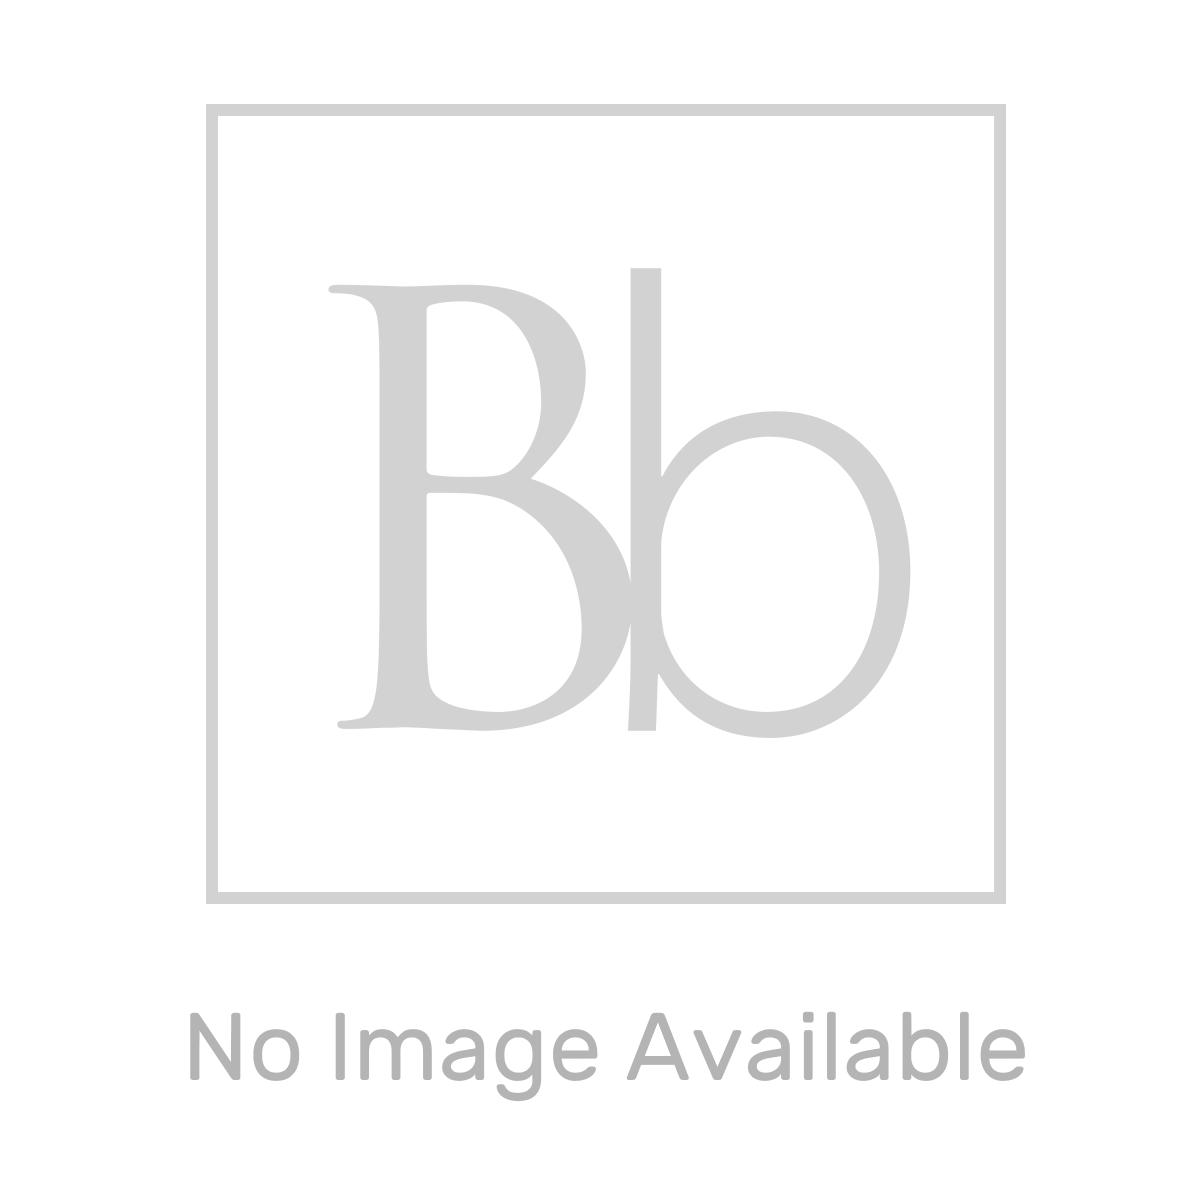 Sensio Destiny LED mirror with lights on